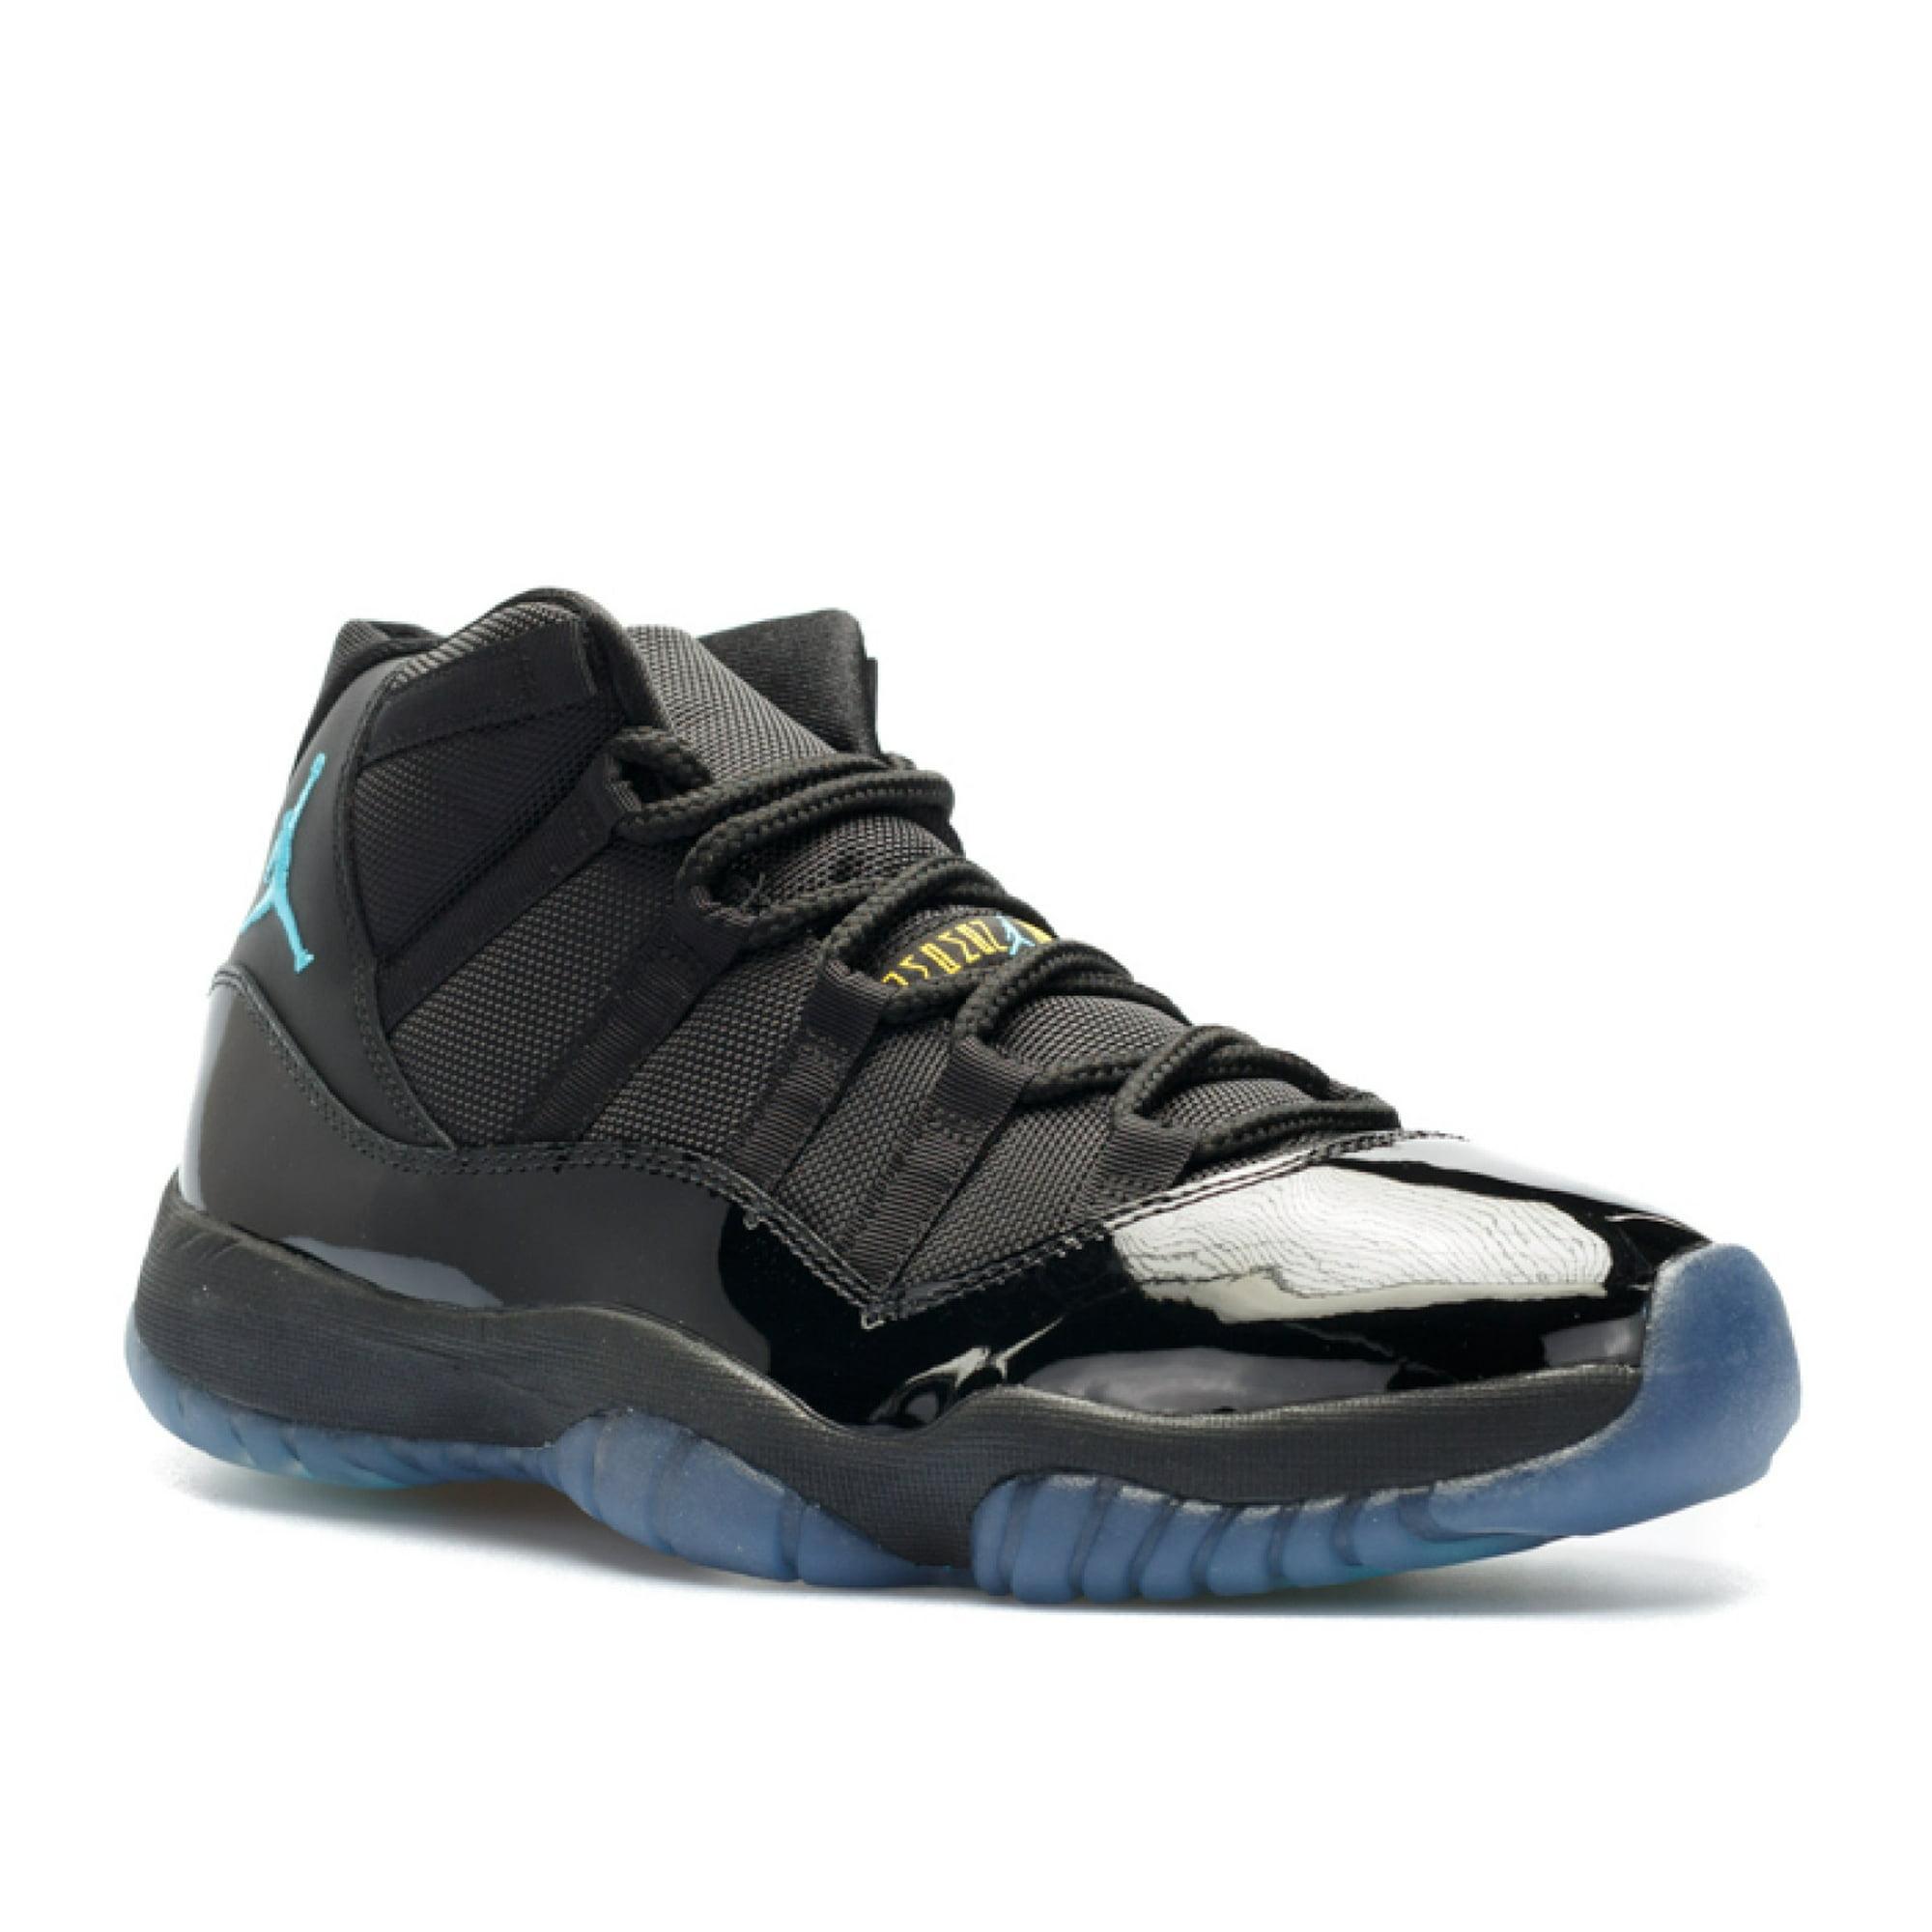 online store 1c09b faf99 Air Jordan - Men - Air Jordan 11 Retro 'Gamma Blue' - 378037-006 - Size 8.5